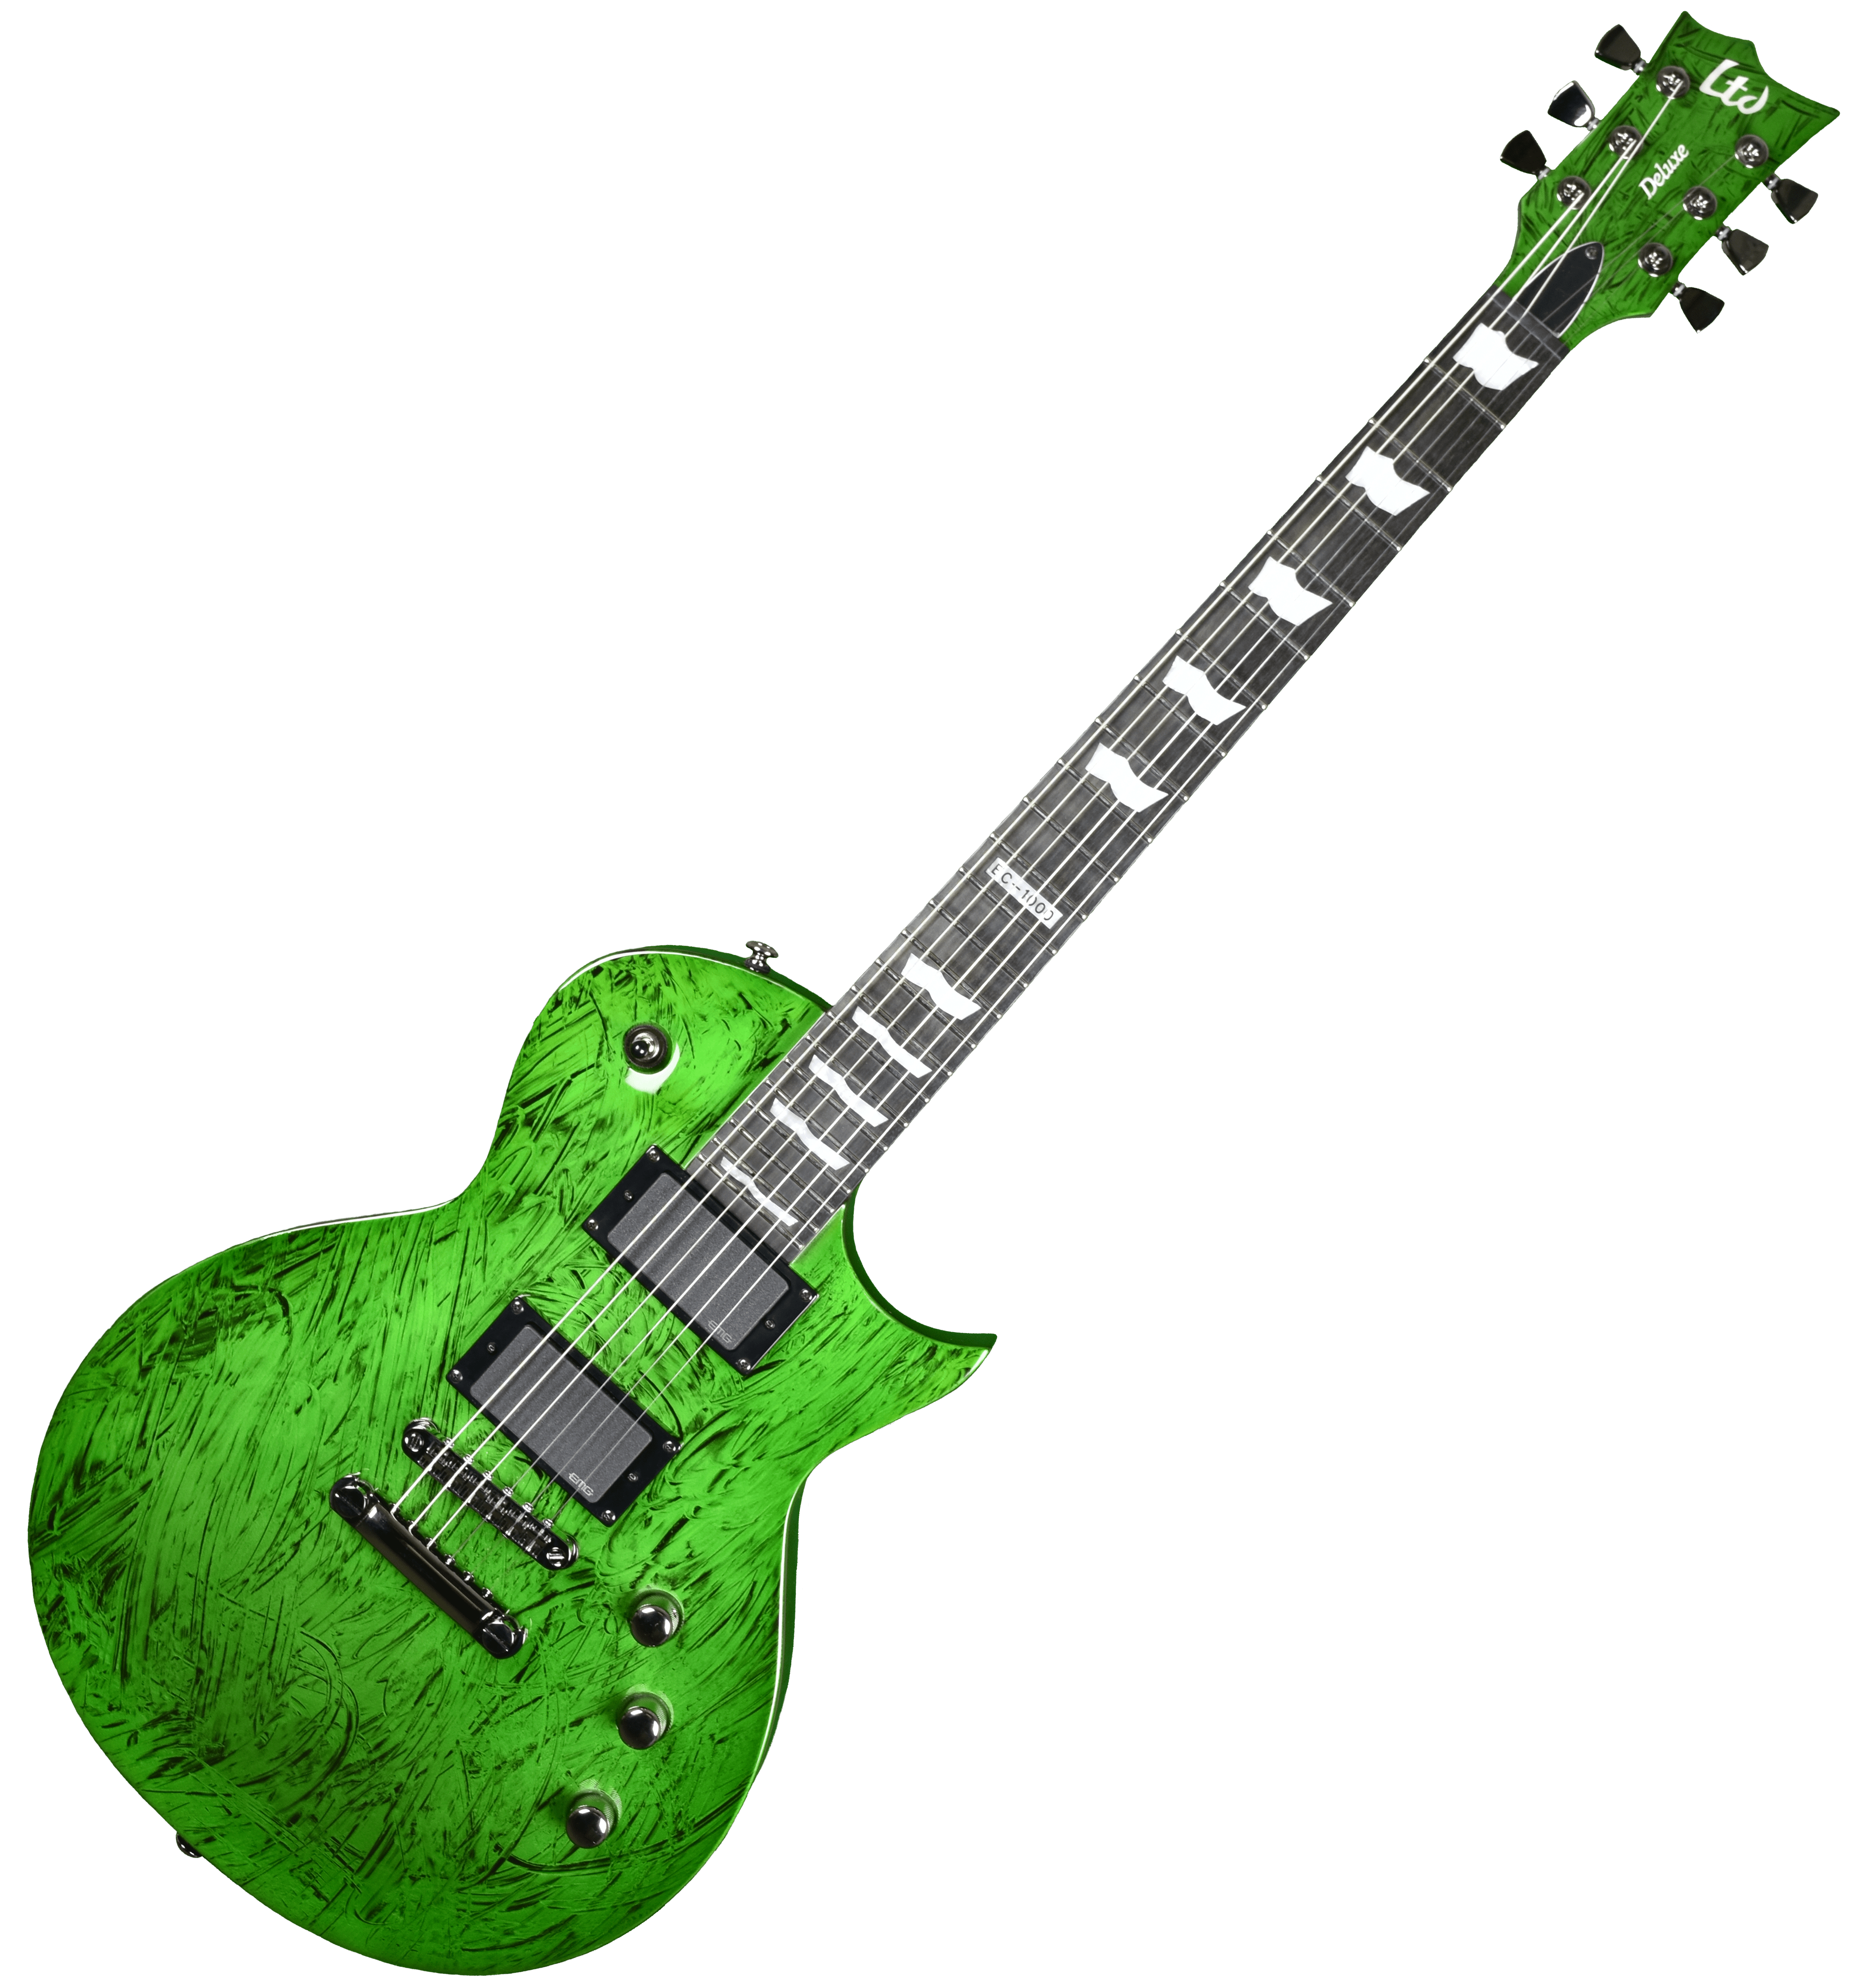 esp ltd deluxe ec 1000 electric guitar in swirl green finish. Black Bedroom Furniture Sets. Home Design Ideas